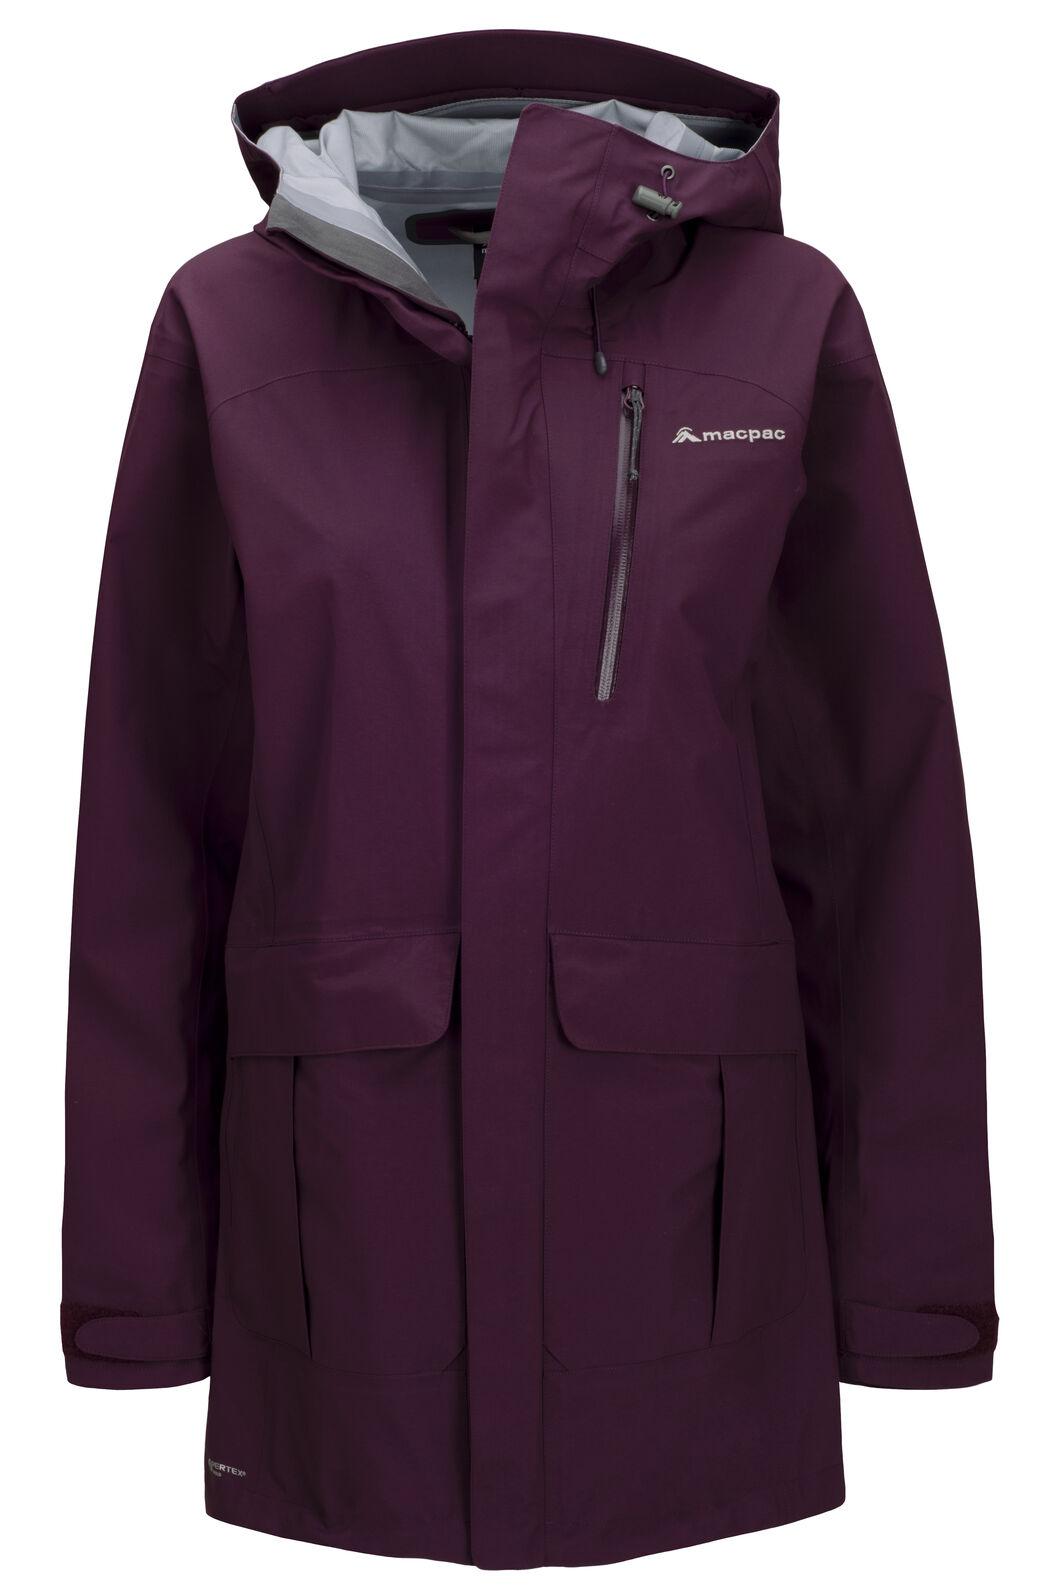 Macpac Women's Copland Pertex® Raincoat, Blackberry Wine, hi-res